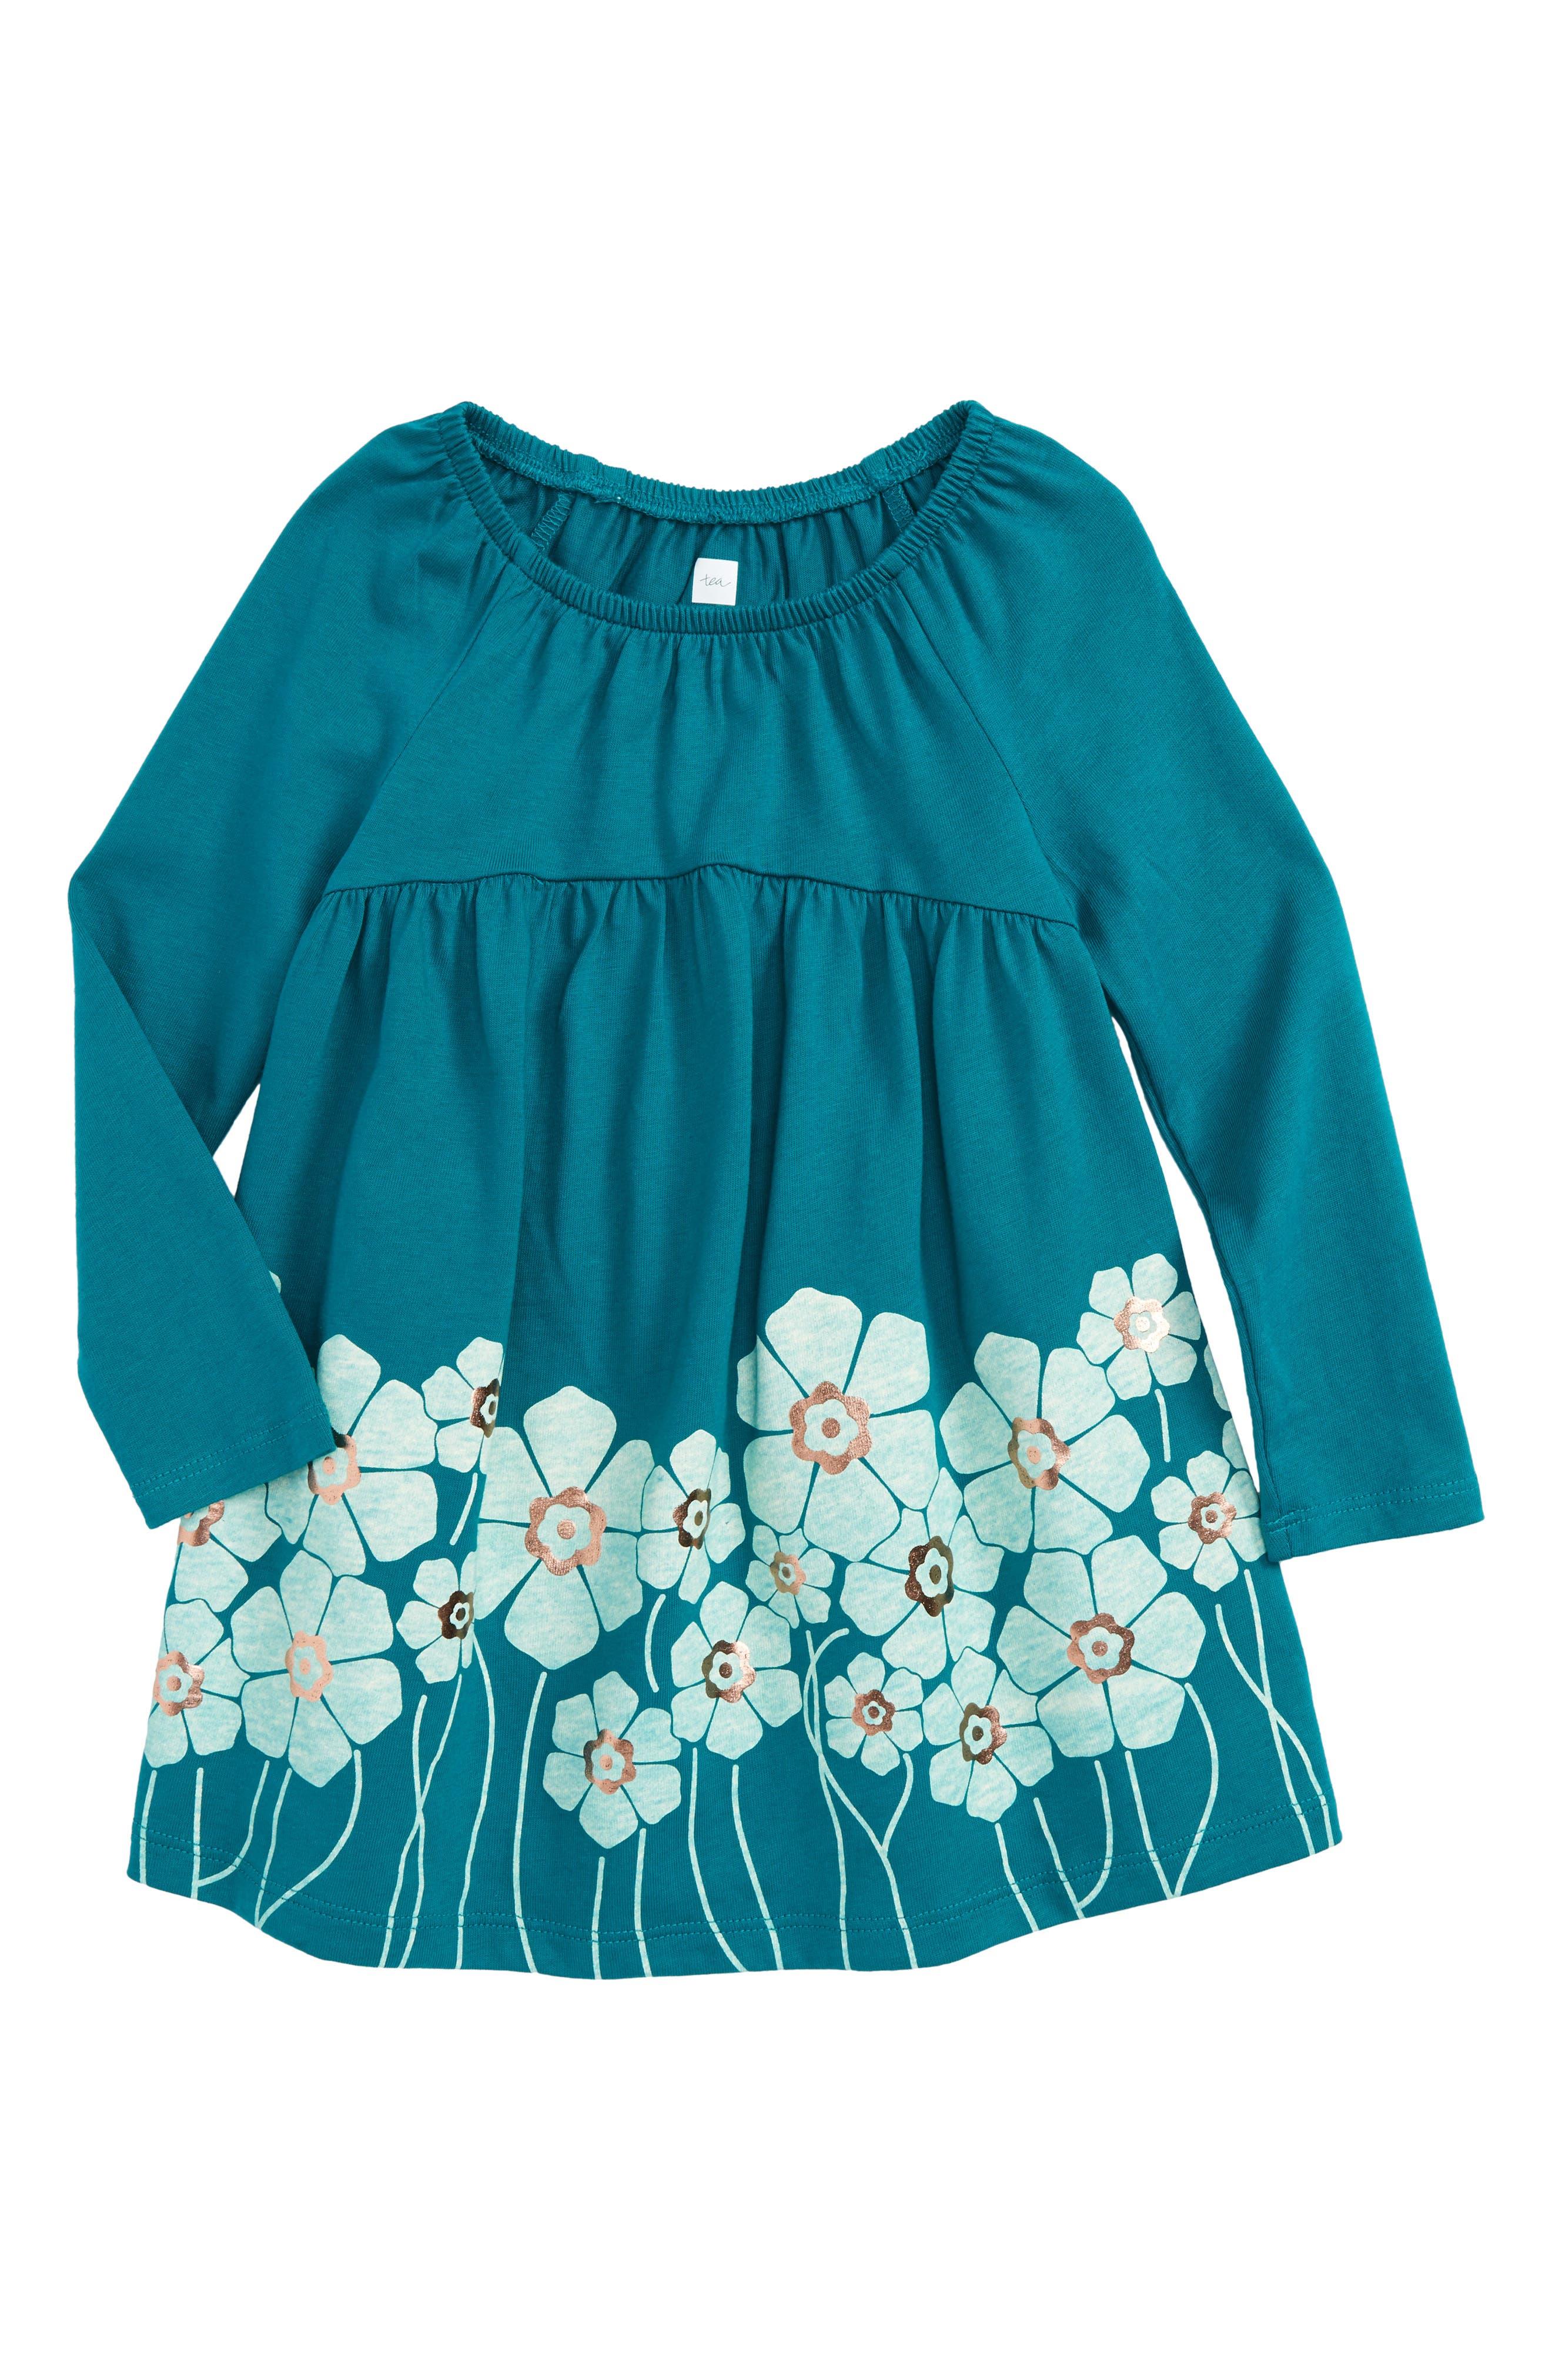 Hatton Dress,                             Main thumbnail 1, color,                             447